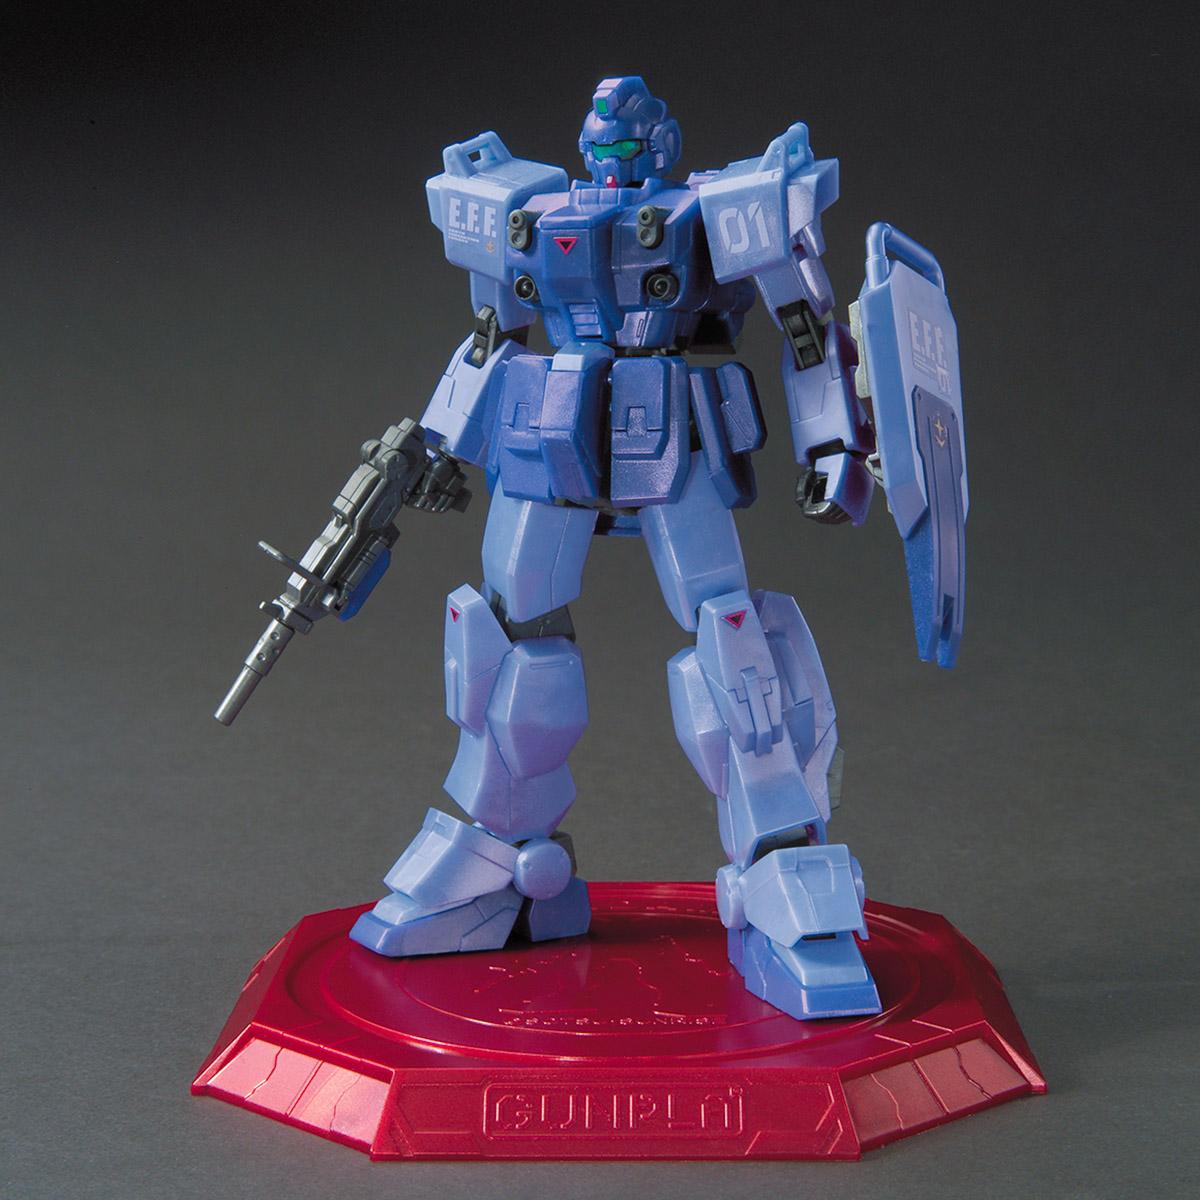 HG 1/144 THE GUNDAM BASE LIMITED BLUE DESTINY UNIT 1[METALLIC GLOSS INJECTION]